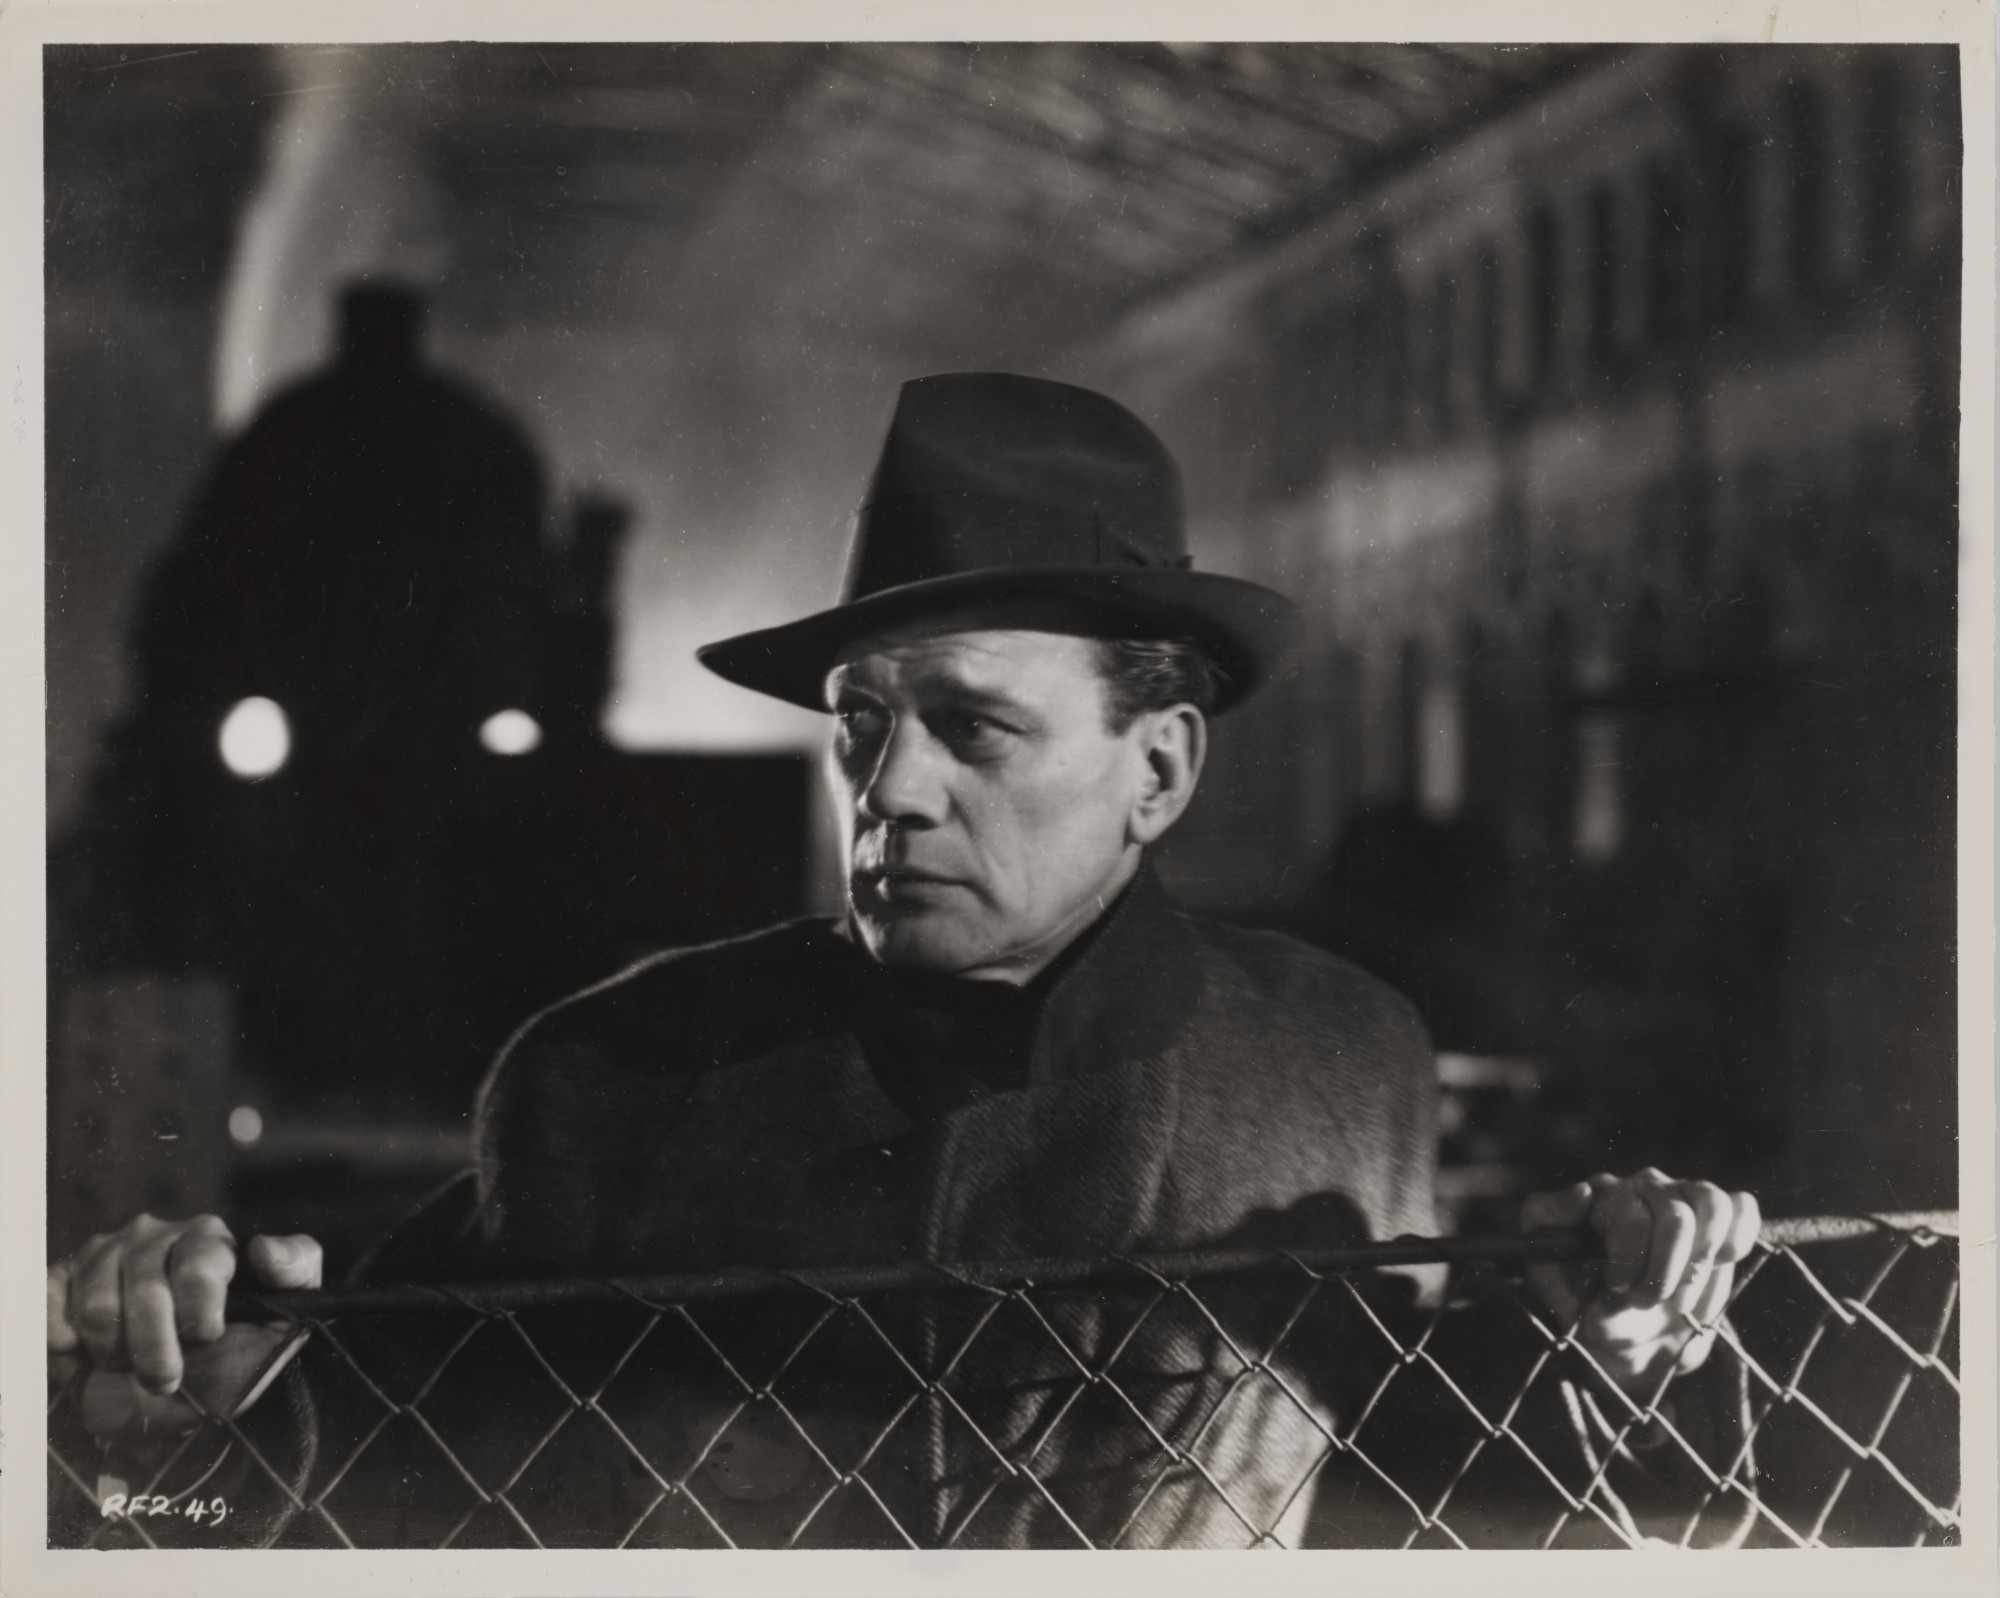 THE THIRD MAN (1949) ORIGINAL PRODUCTION STILL, BRITISH